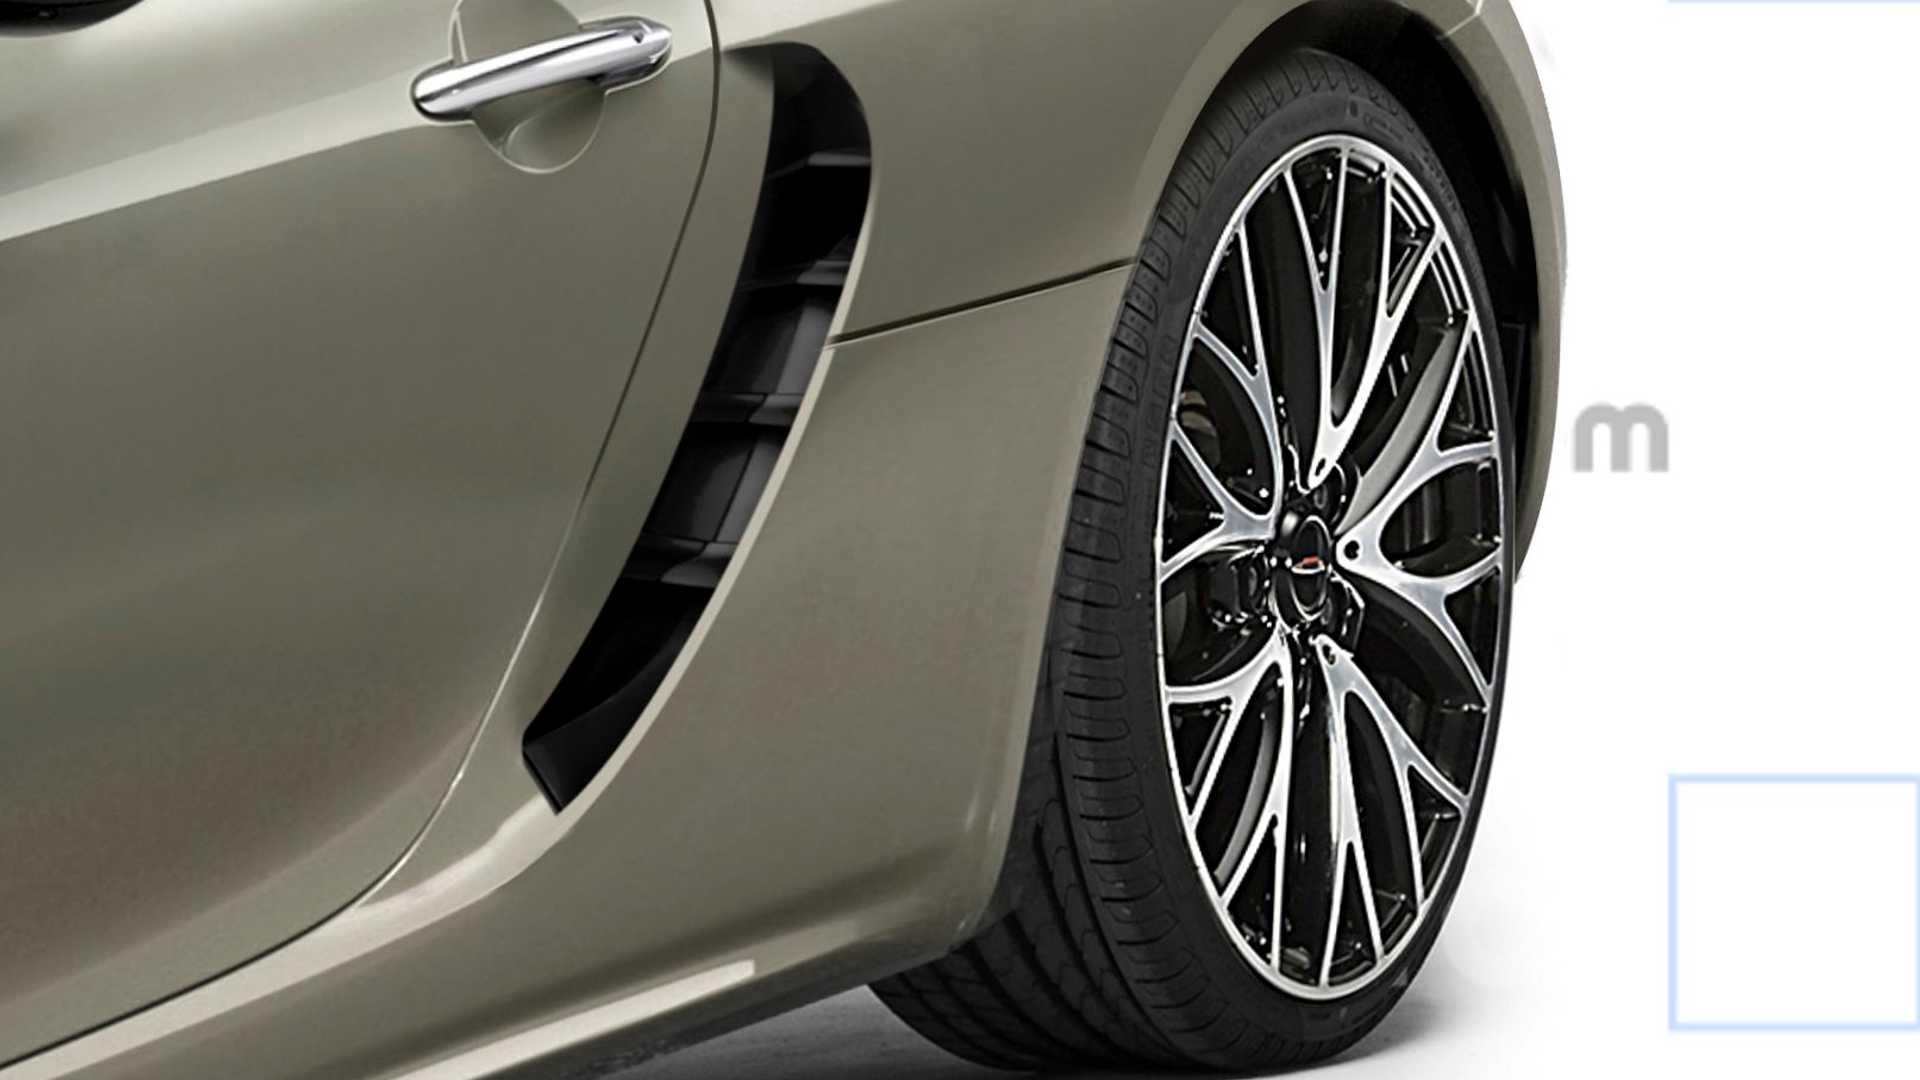 Каким будет суперкар Mini со средним расположением двигателя?